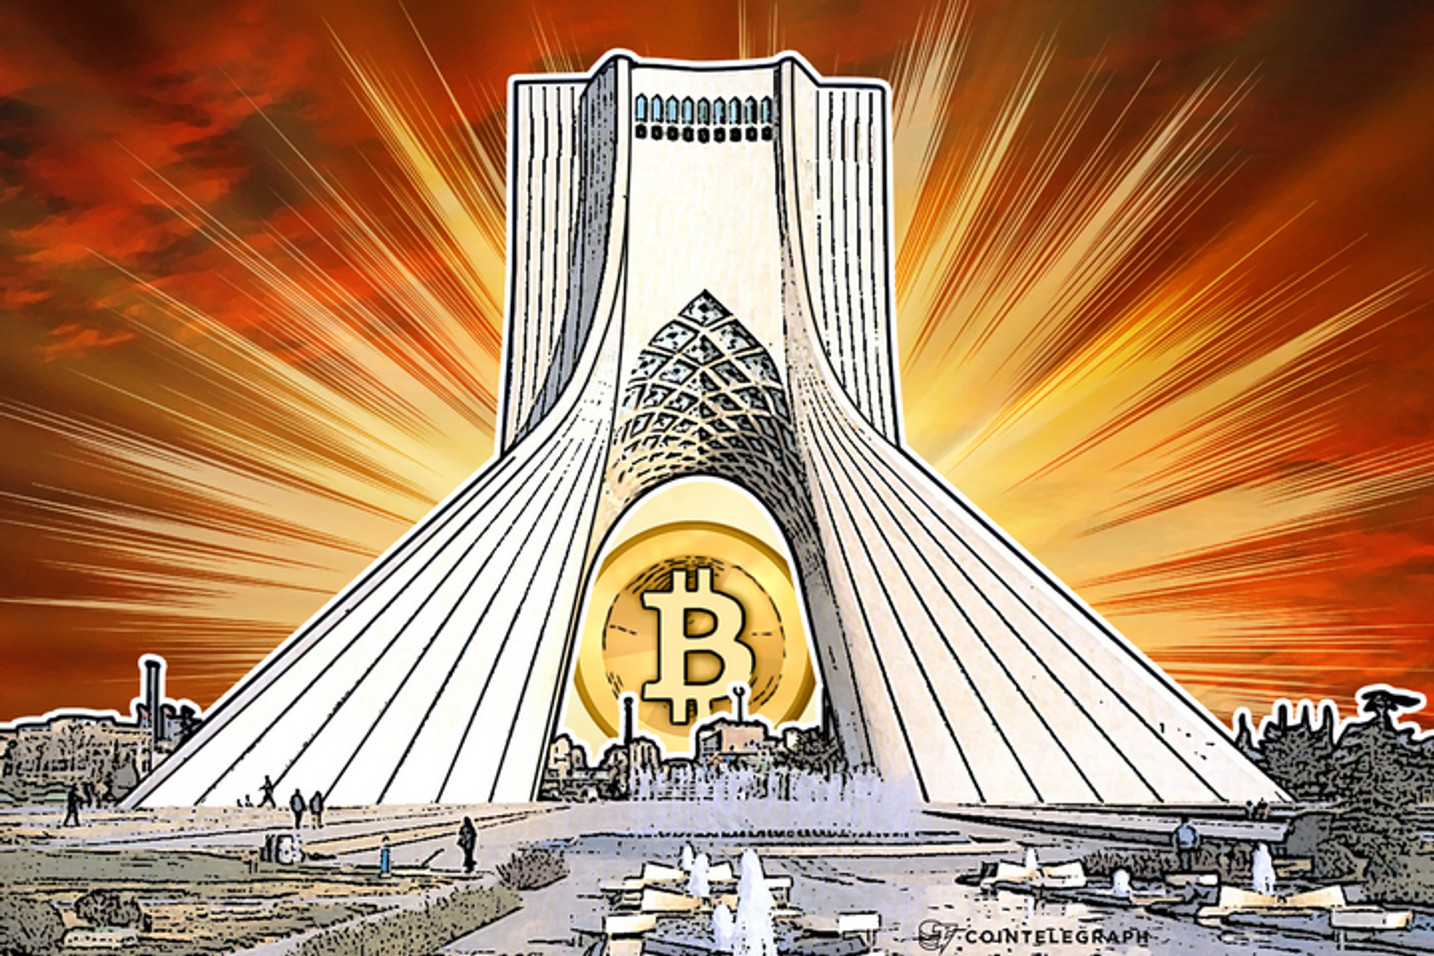 Bitcoin: Iran's Savior in the Economic Crisis? (Op-Ed)